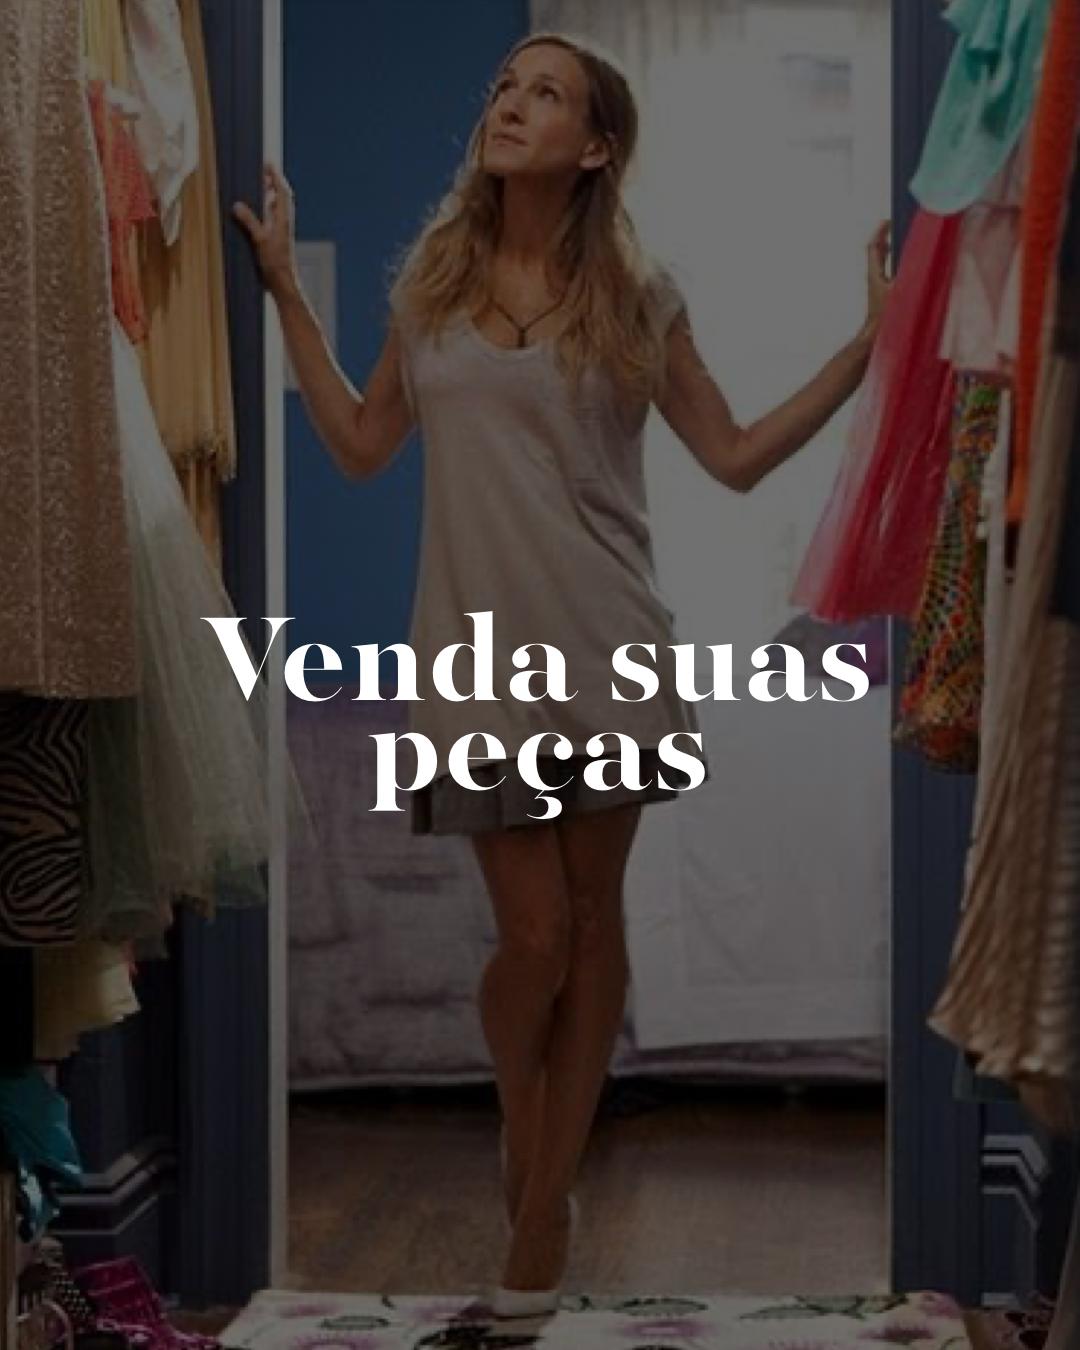 Vender roupas